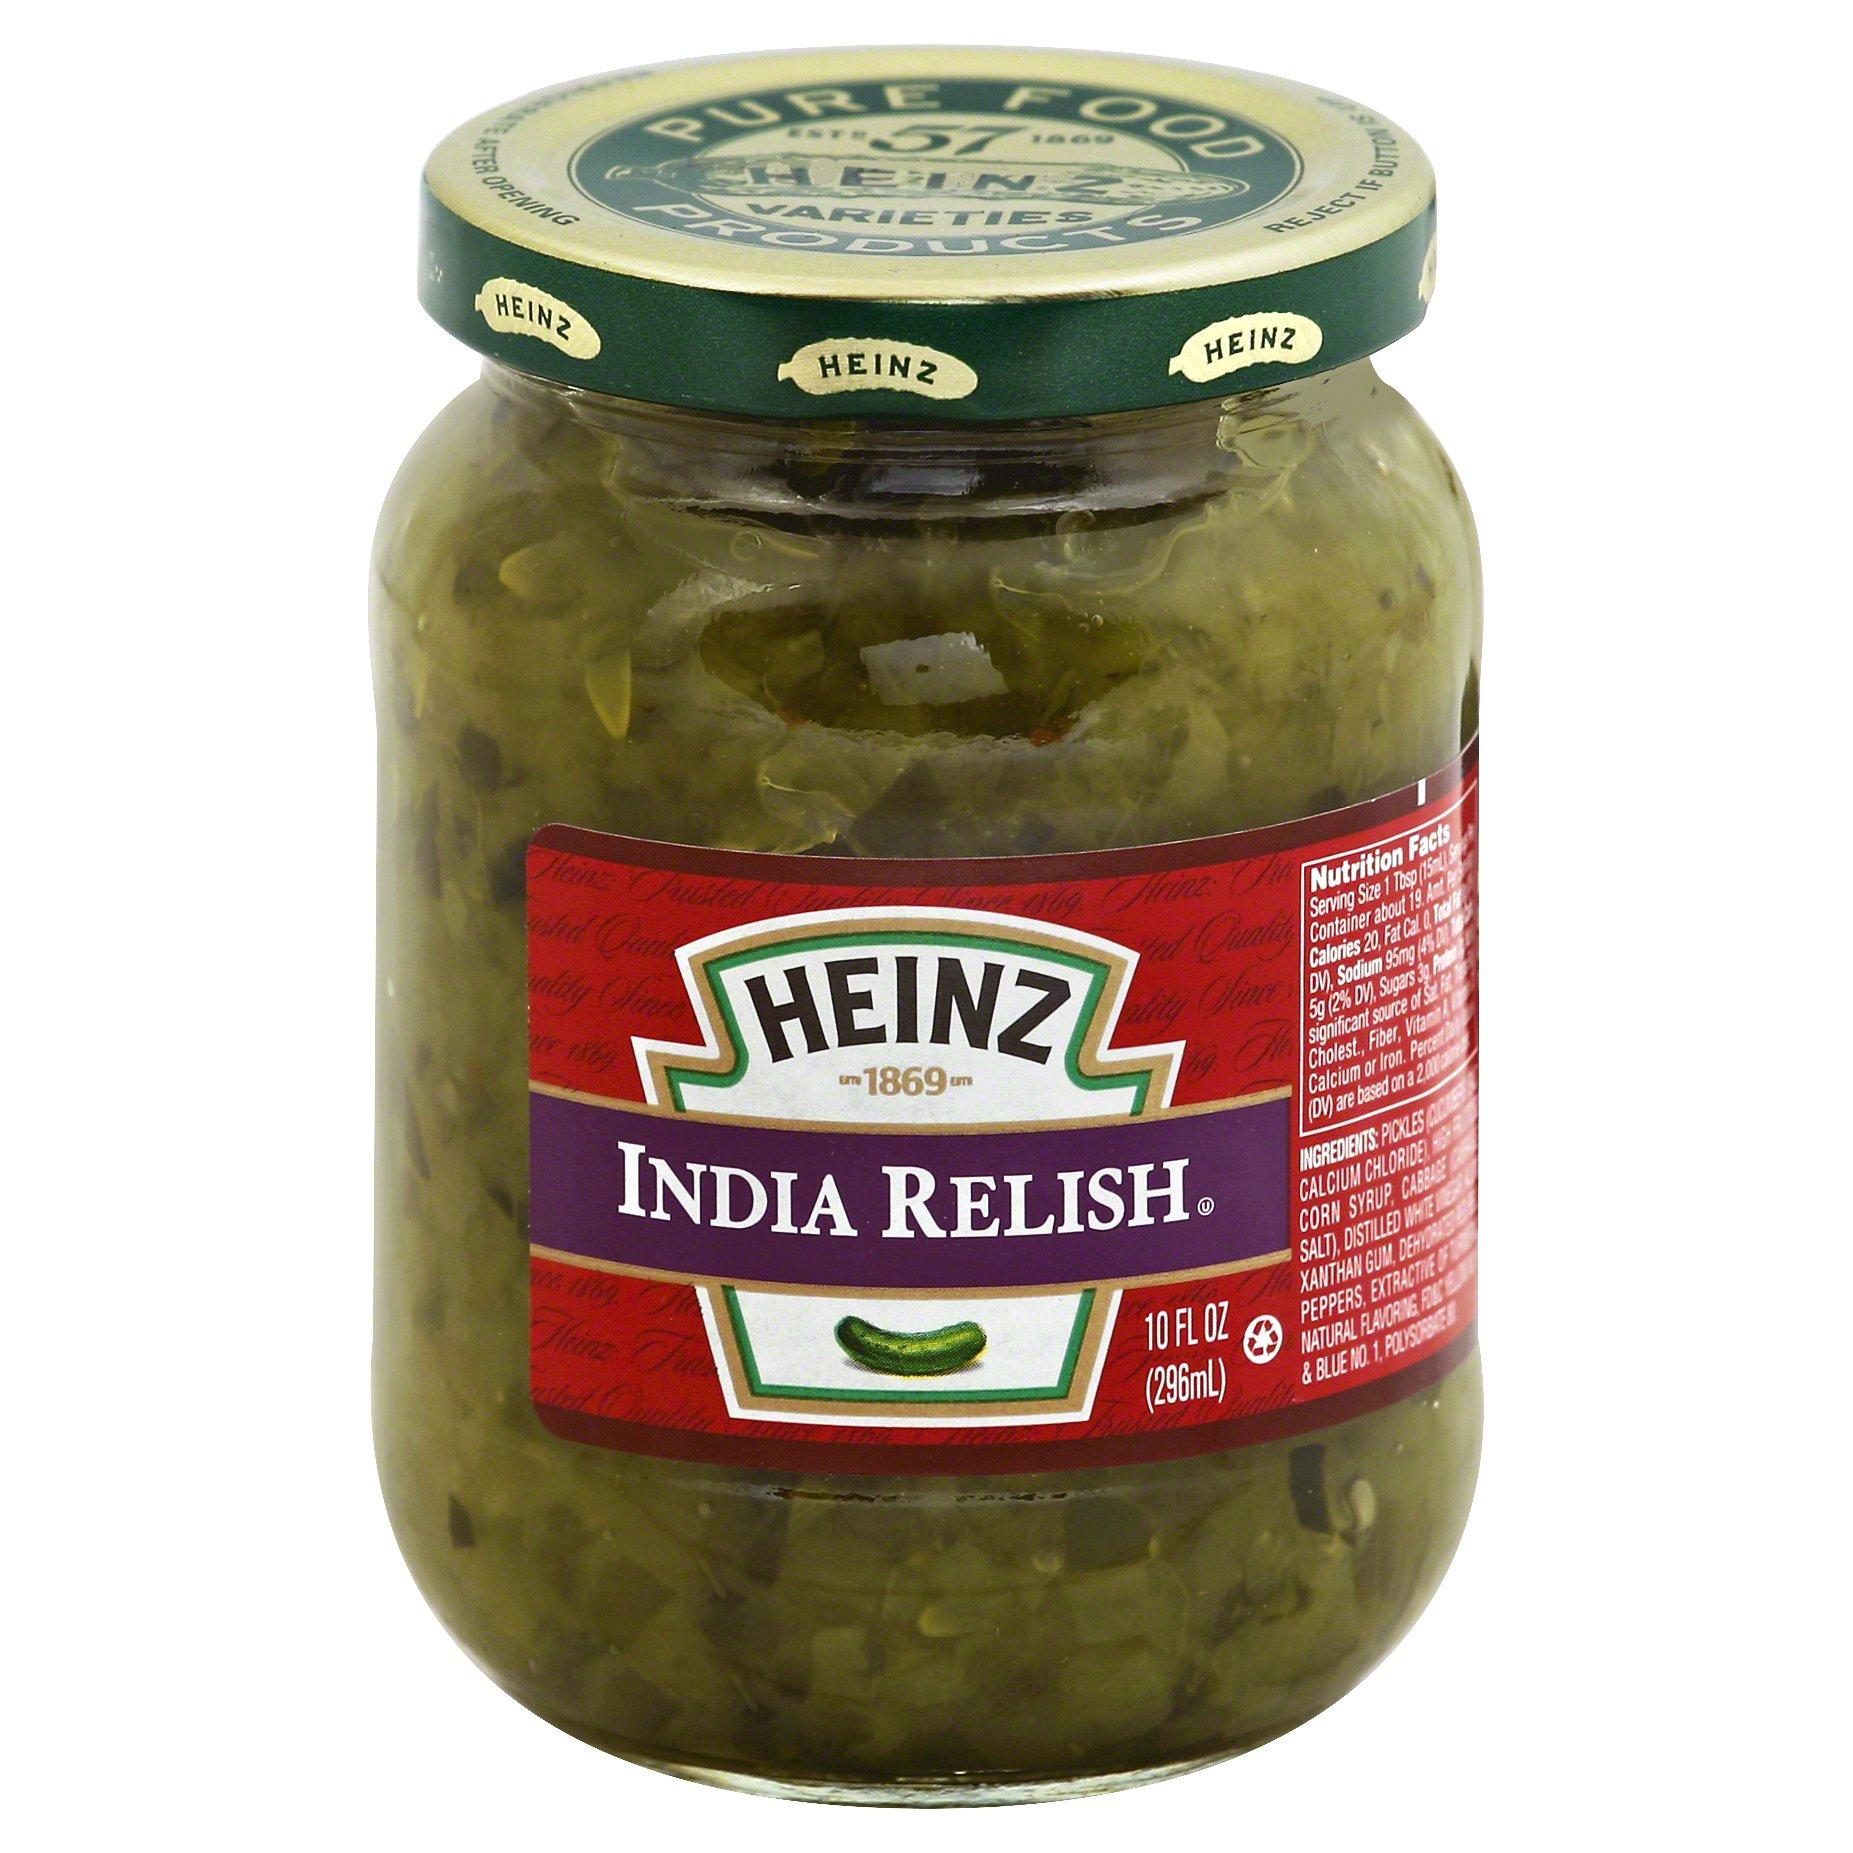 Heinz India Relish 10.0 OZ 12-Pack